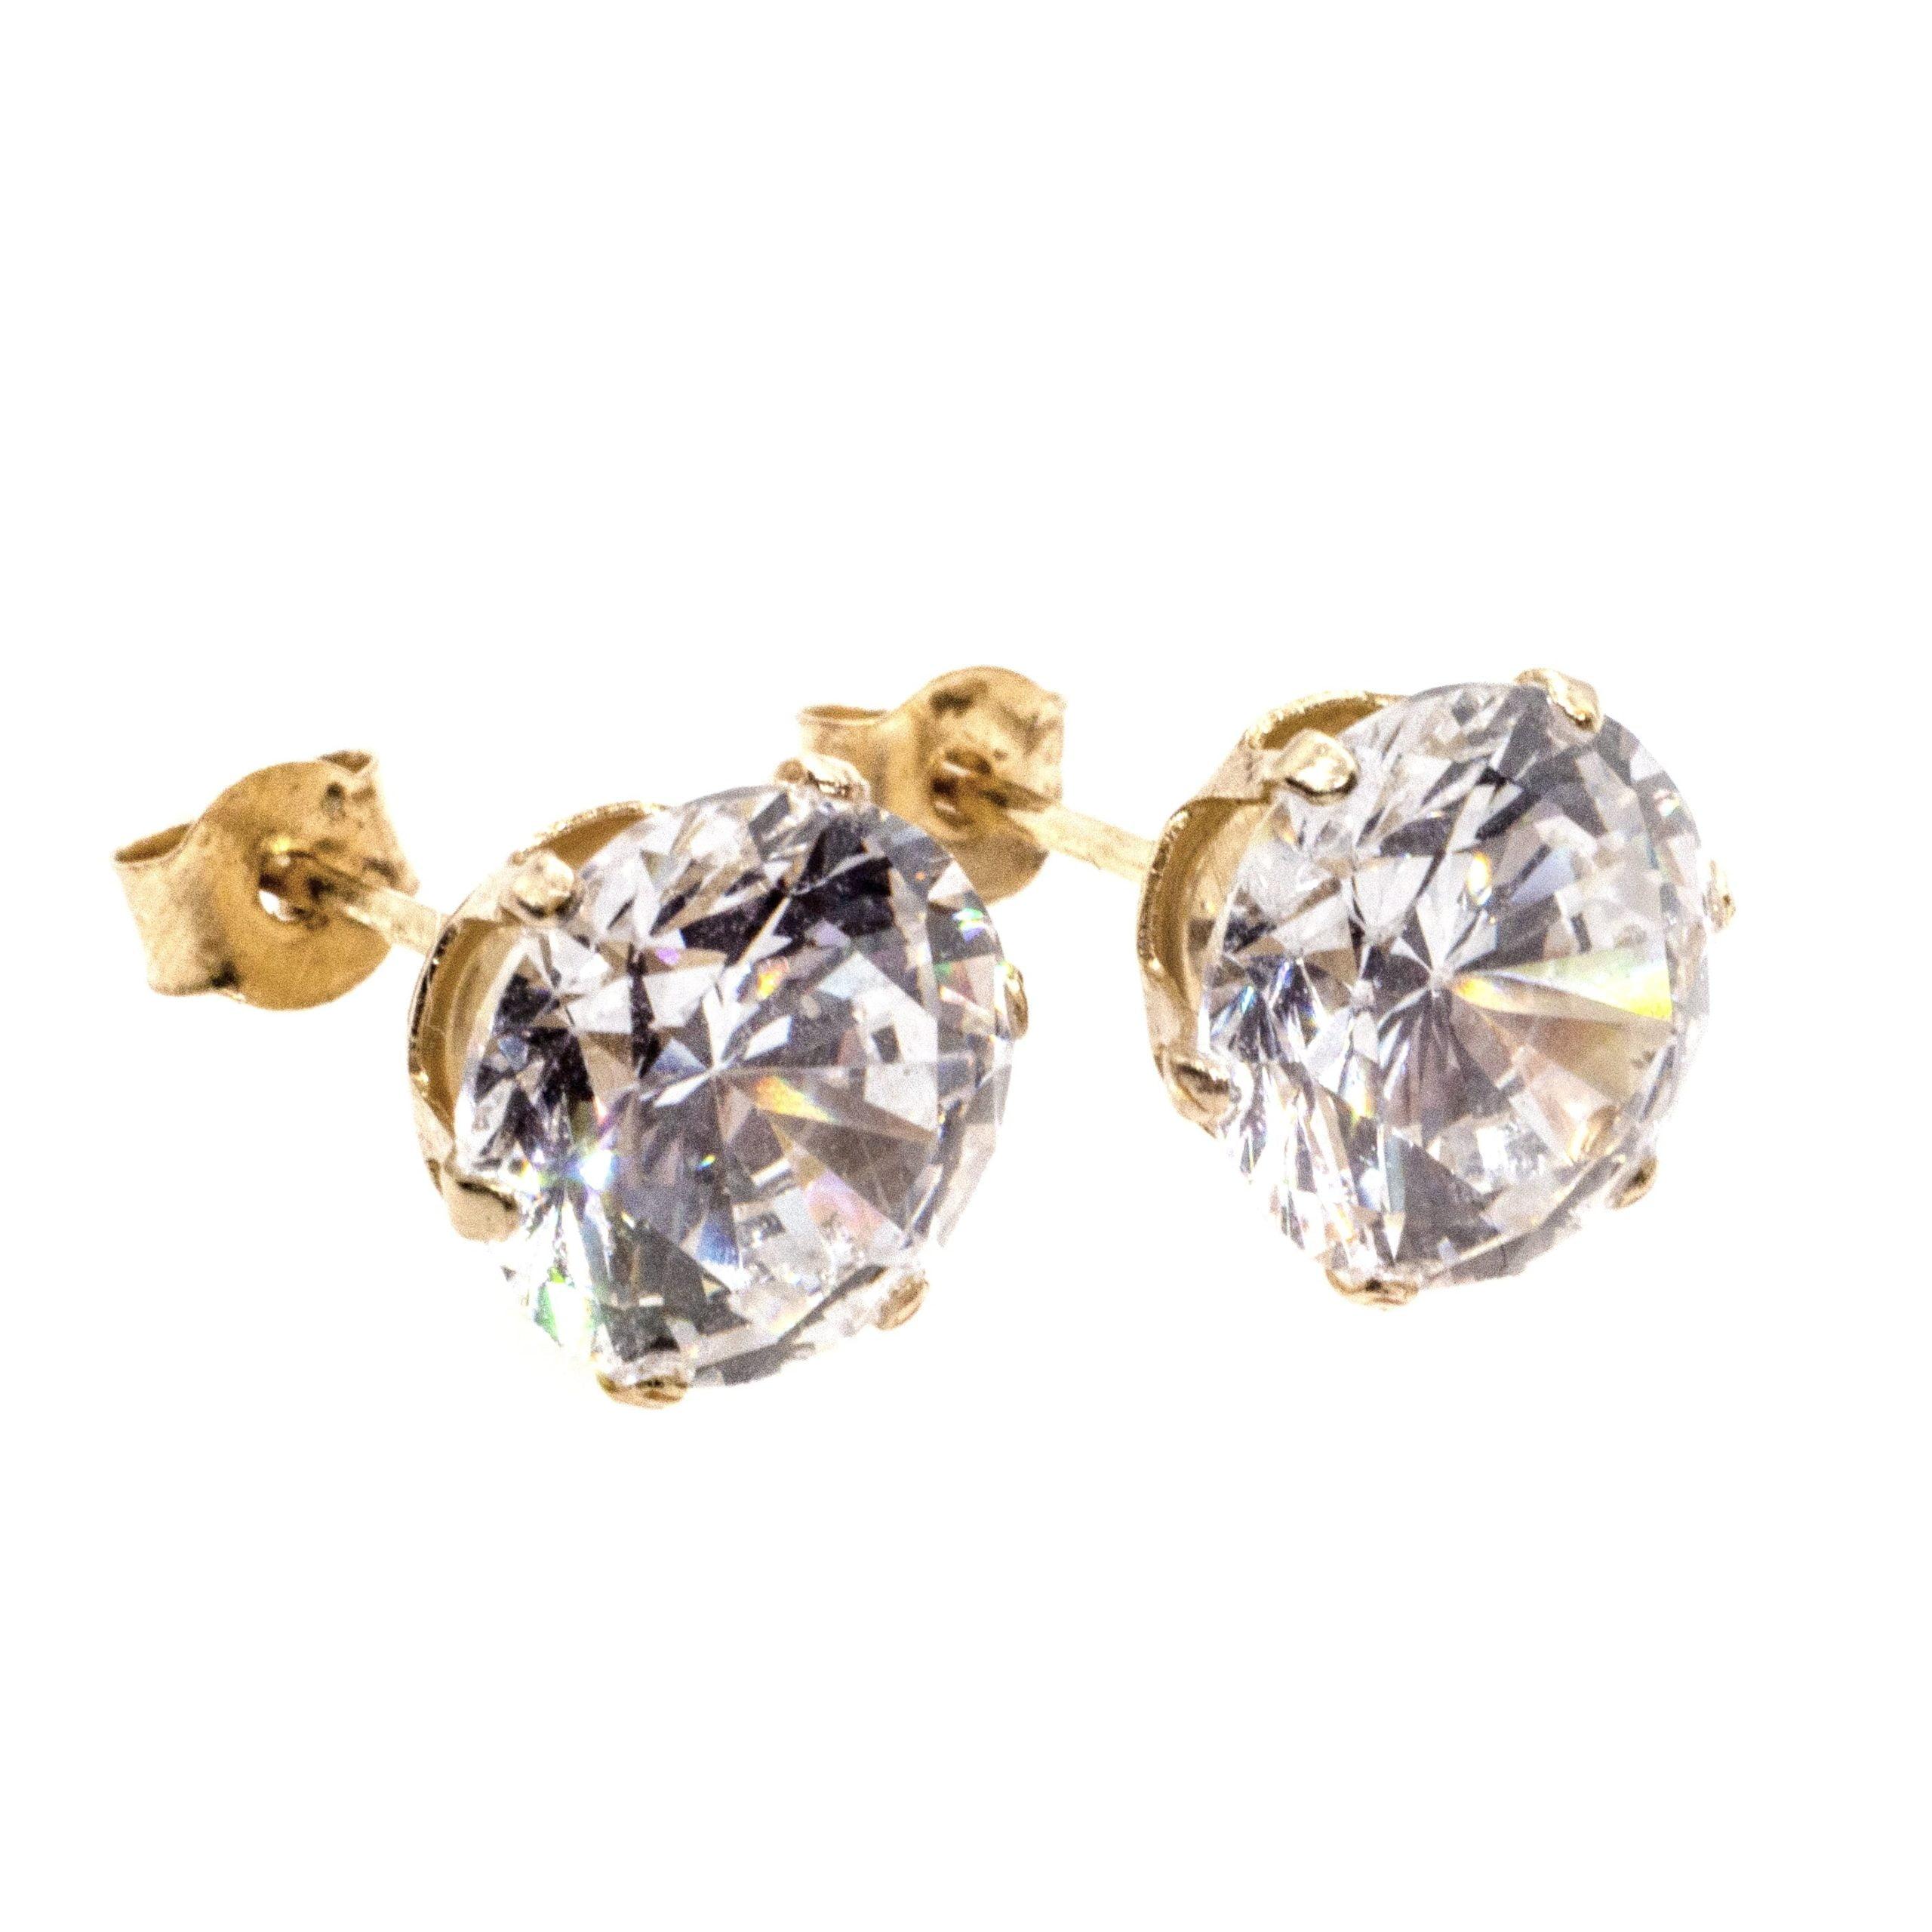 7mm CZ stud earrings 9ct yellow gold alt 3